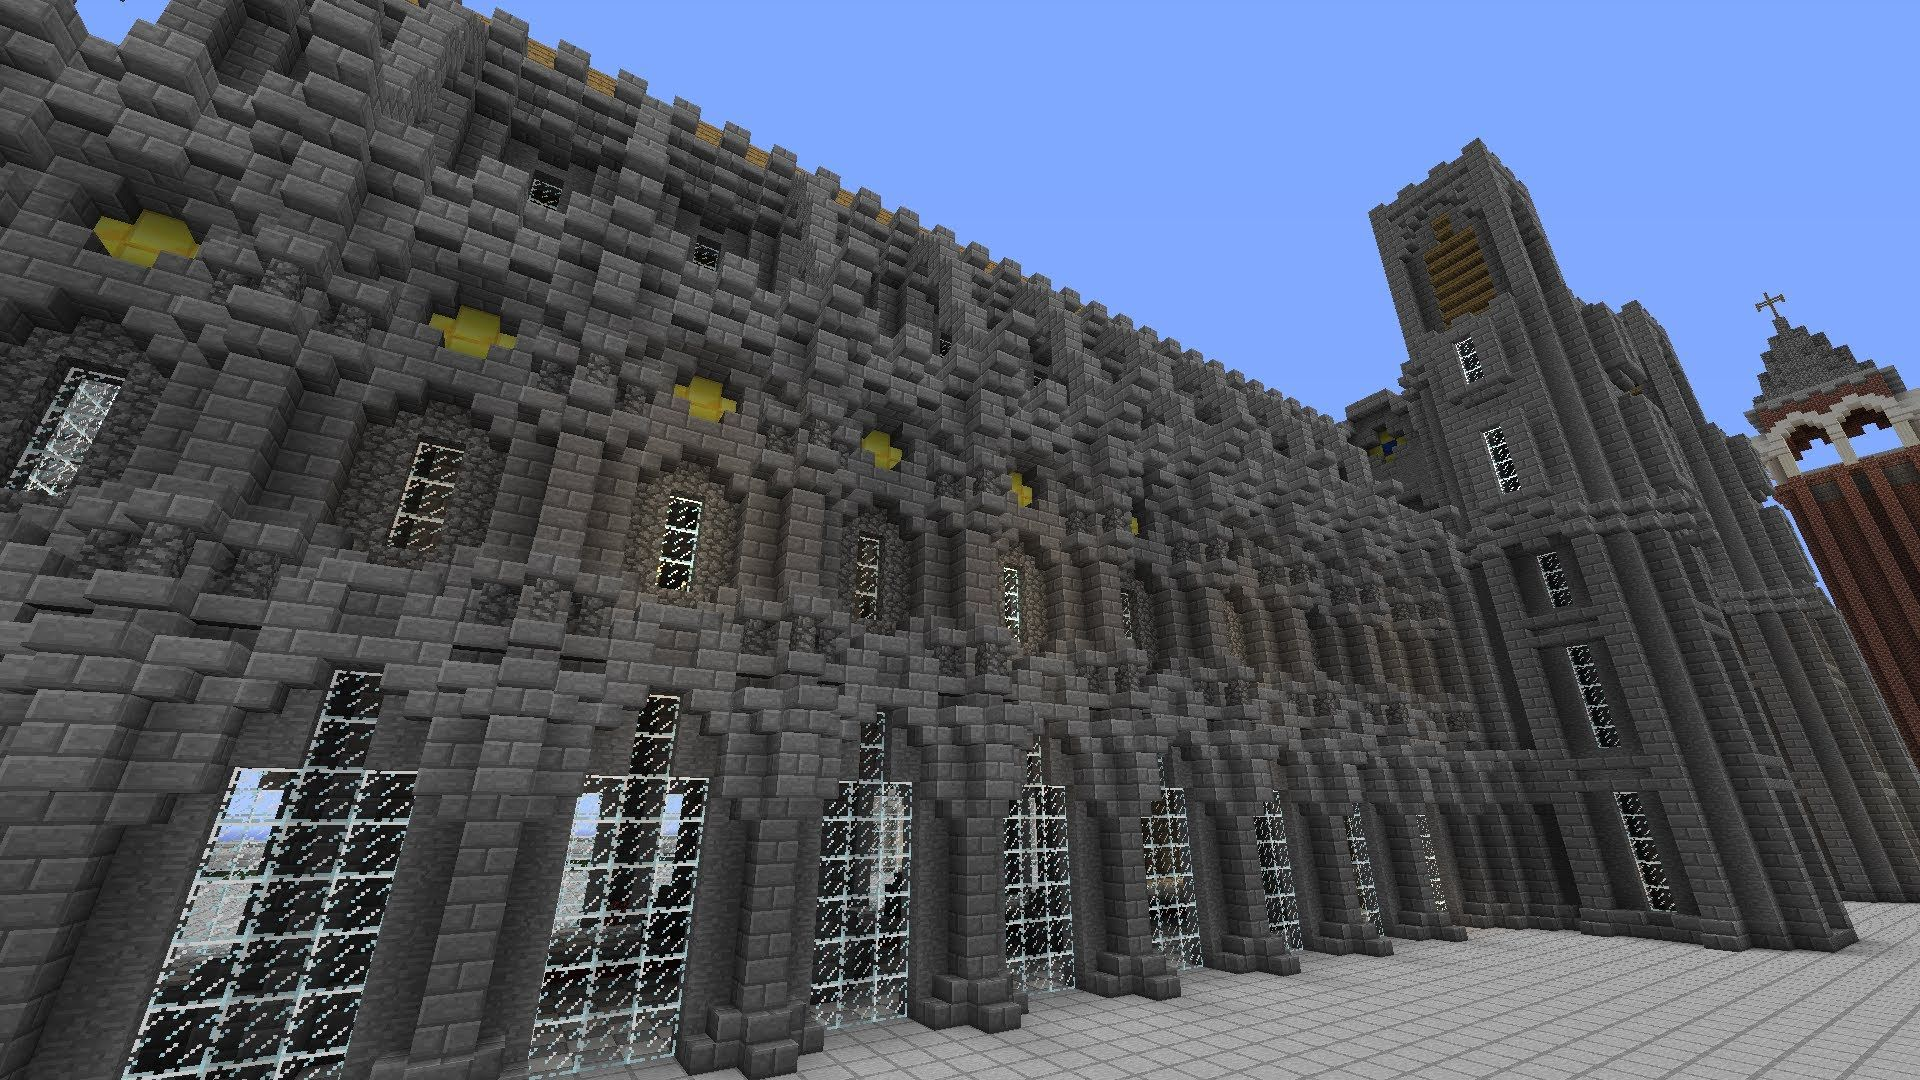 minecraft castle walls - Google Search | weapons | Pinterest ...